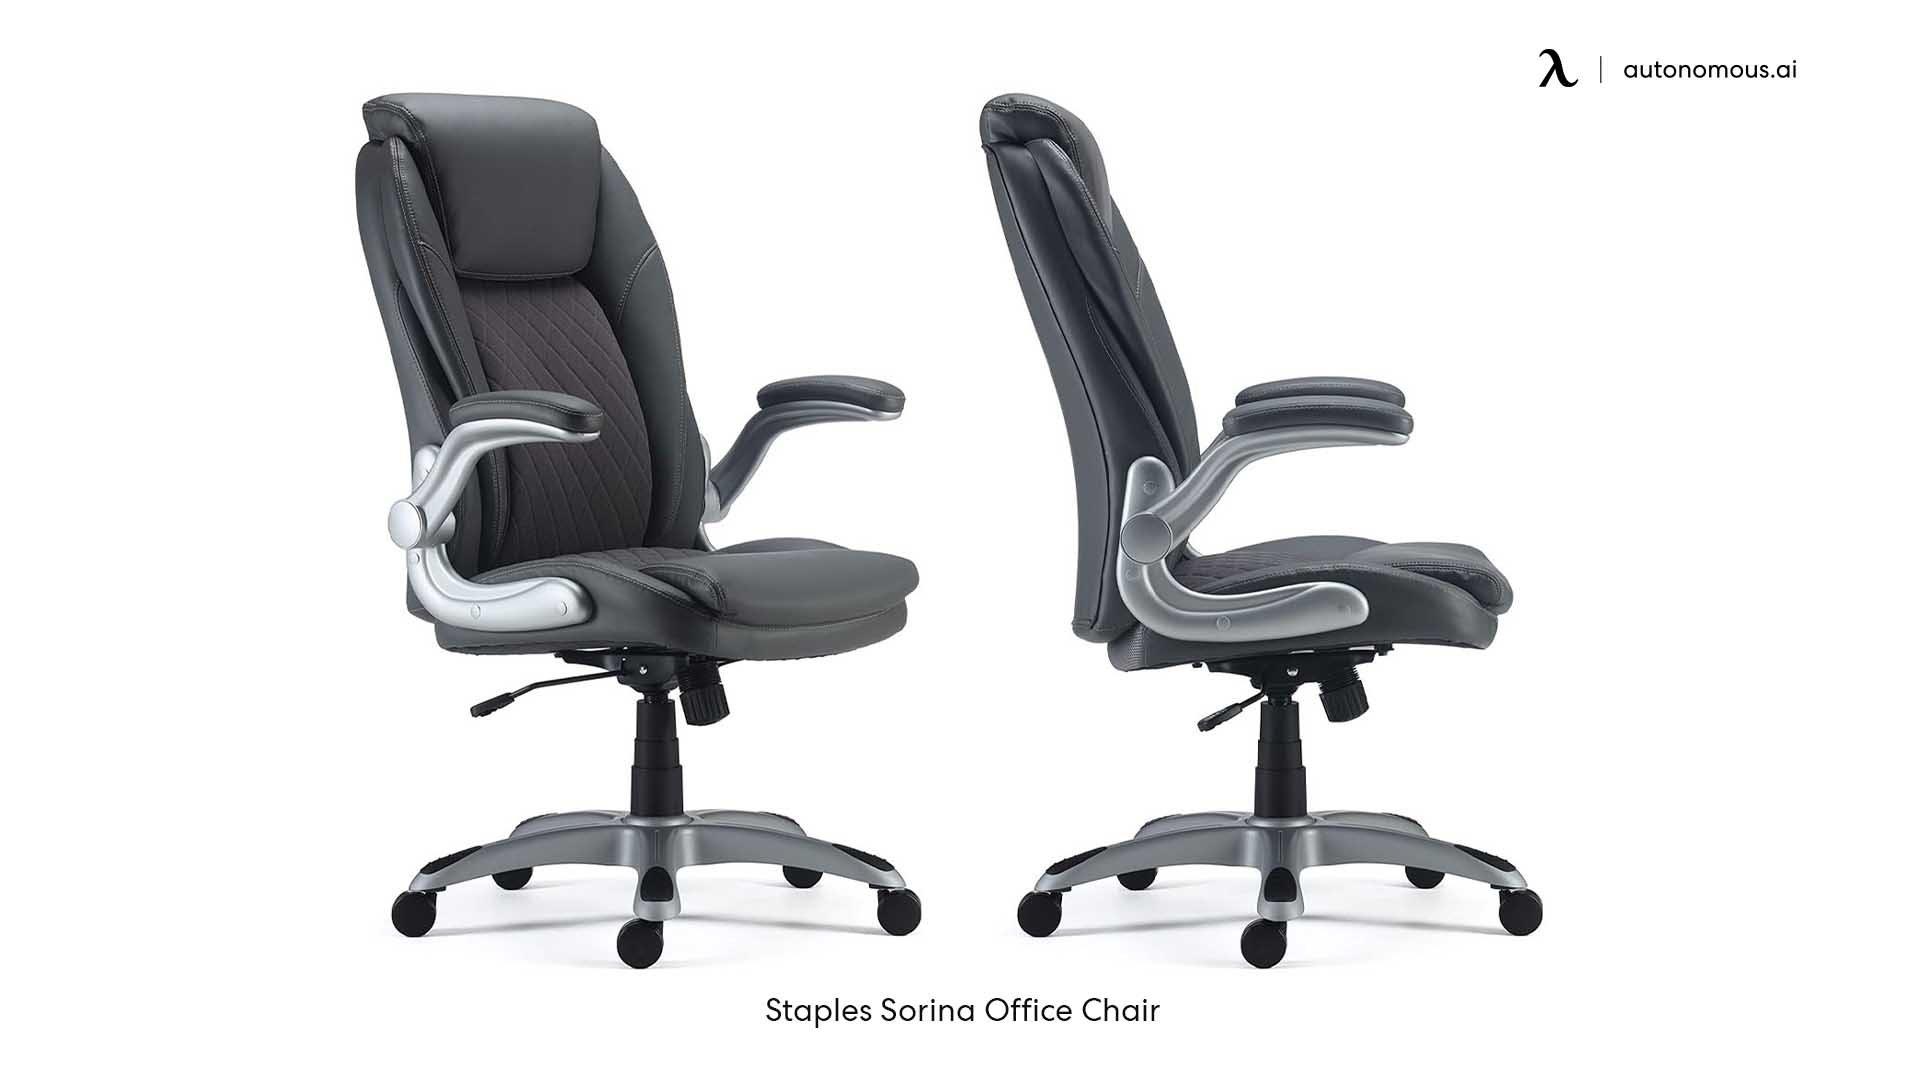 Staples Sorina modern desk chair